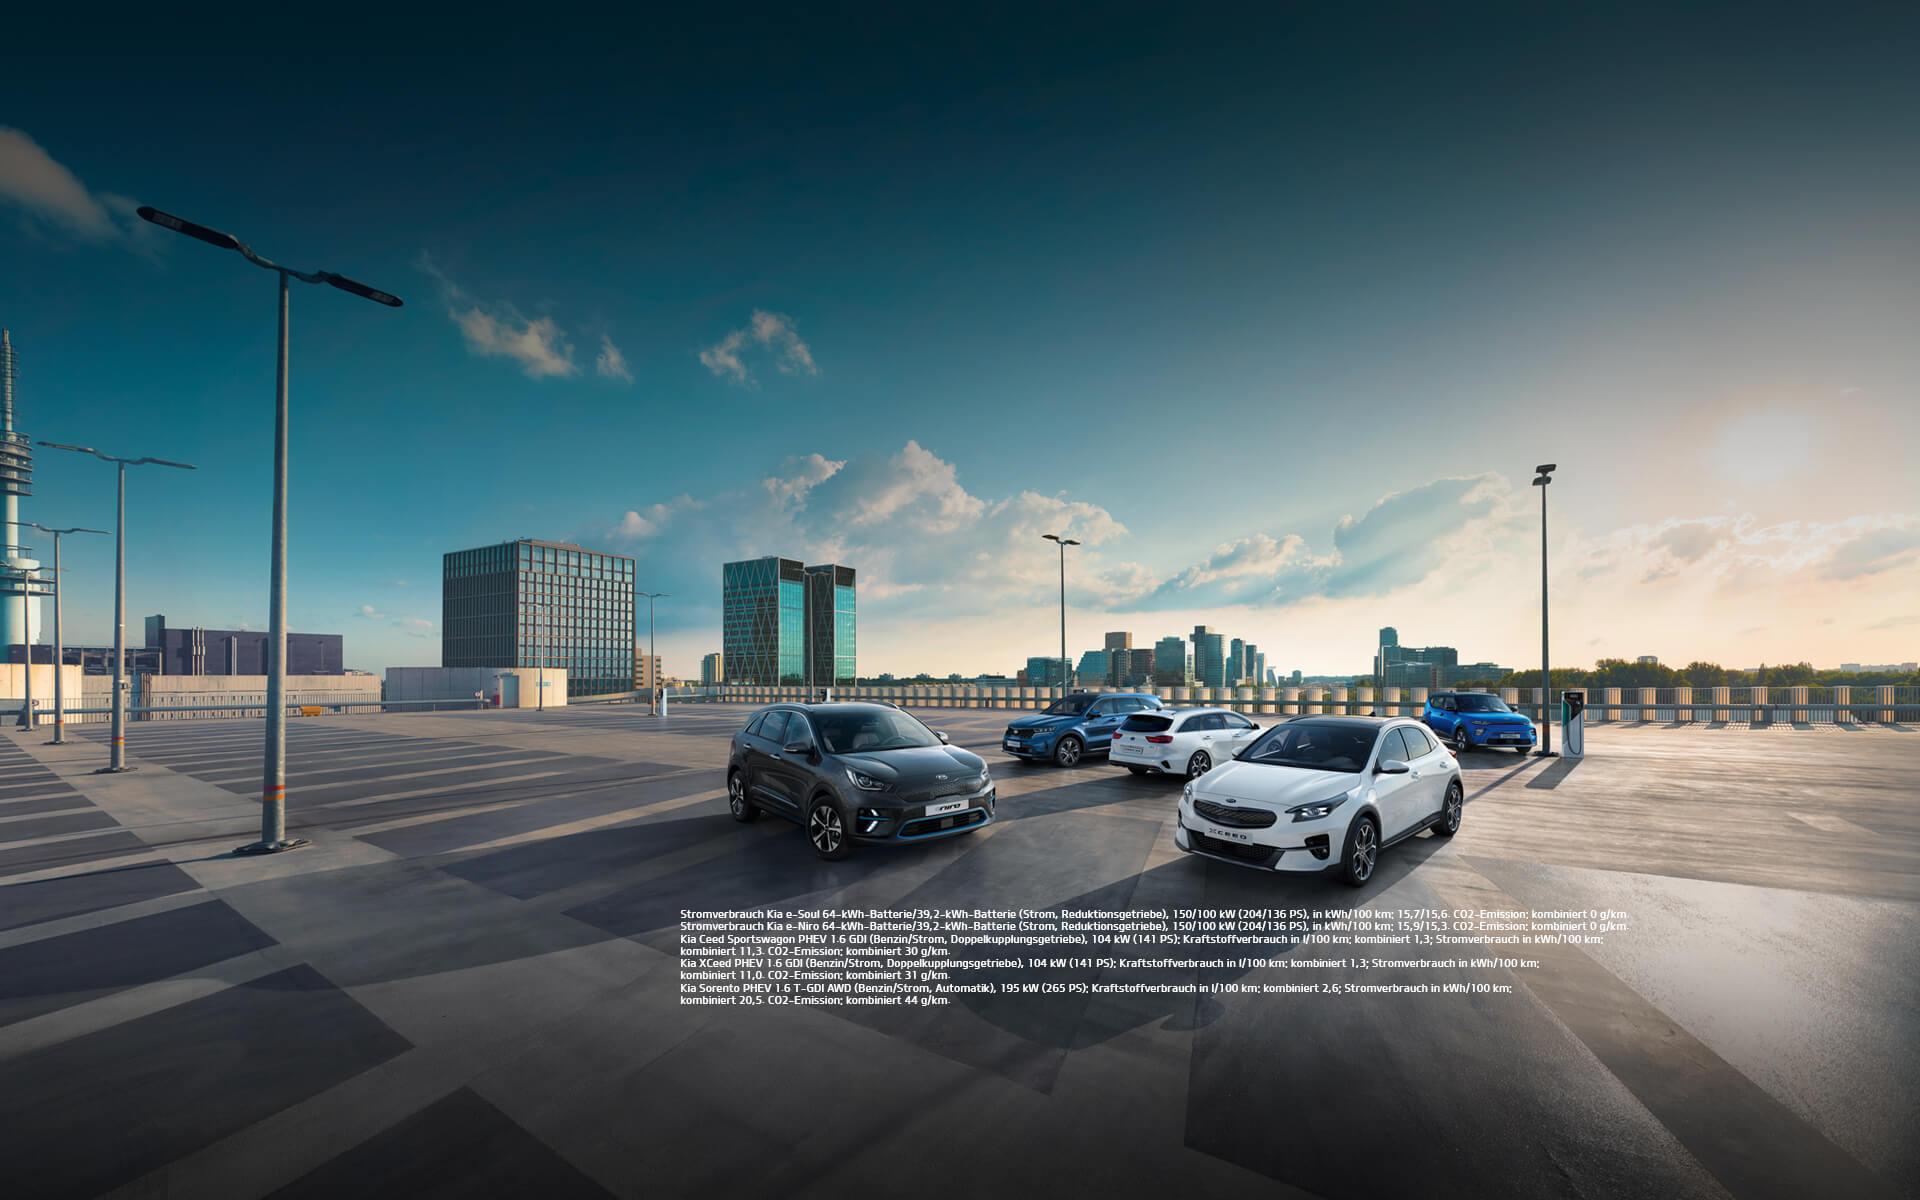 Bild Kia Innovationsprämie mit den Fahrzeugen e-Soul, e-Niro, Ceed SW PHEV, XCeed PHEV und Sorento PHEV